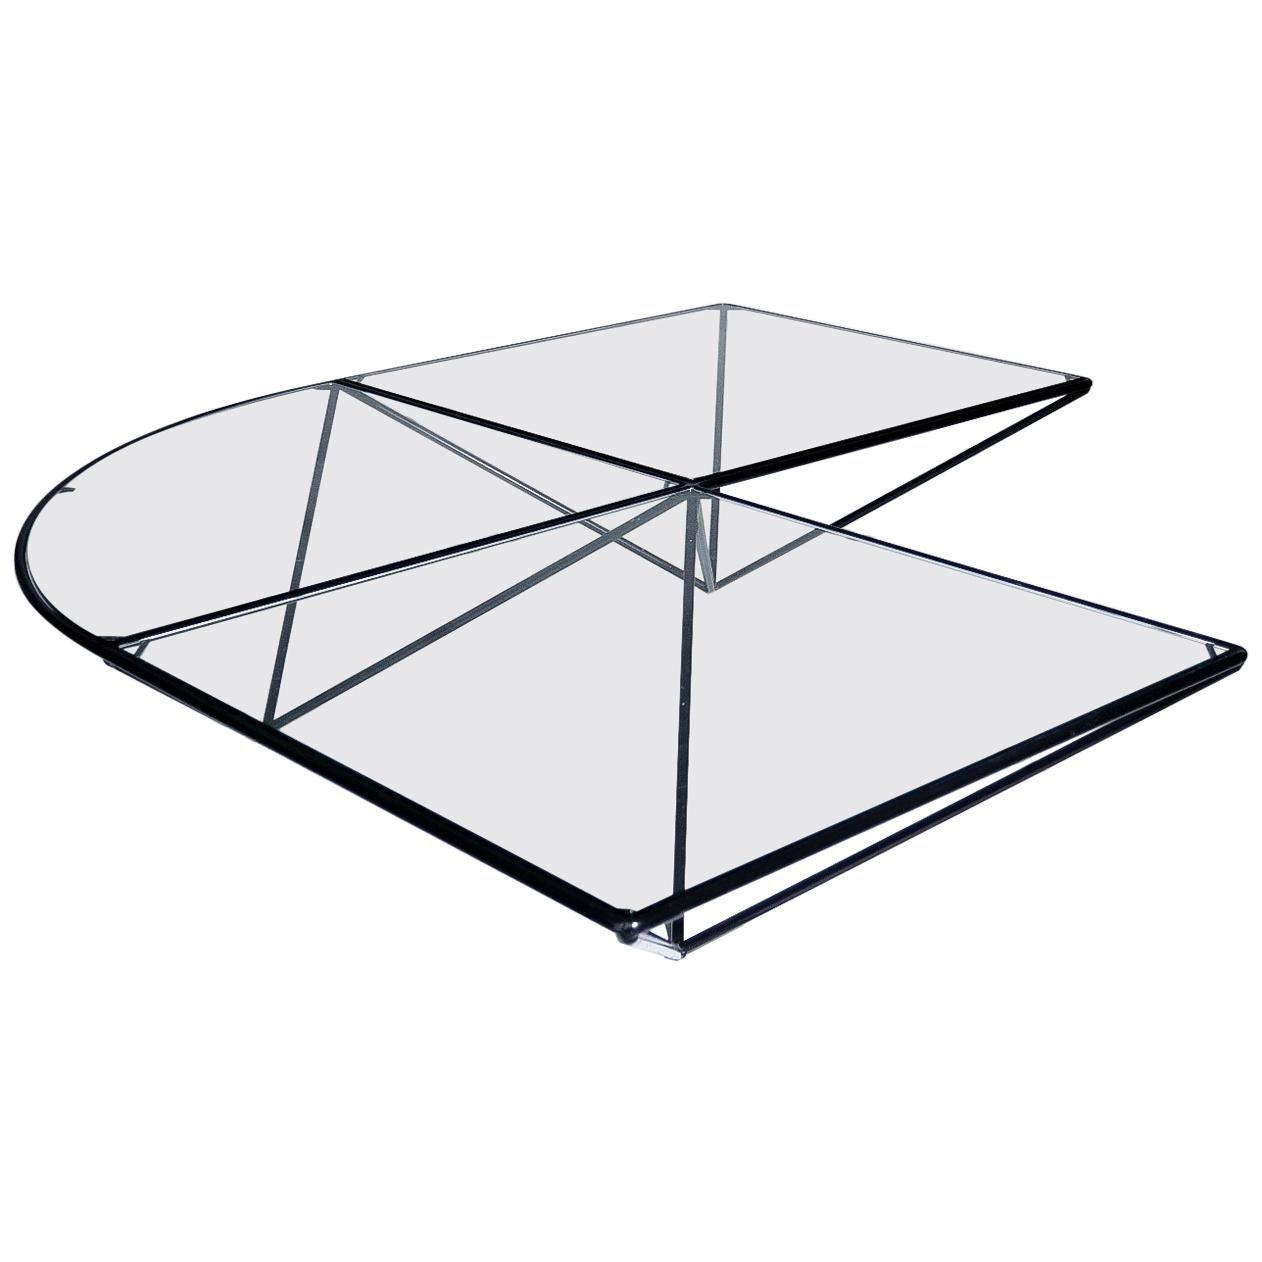 "Paolo Piva Style ""Alanda"" Pyramid Coffee Table 80's Design"